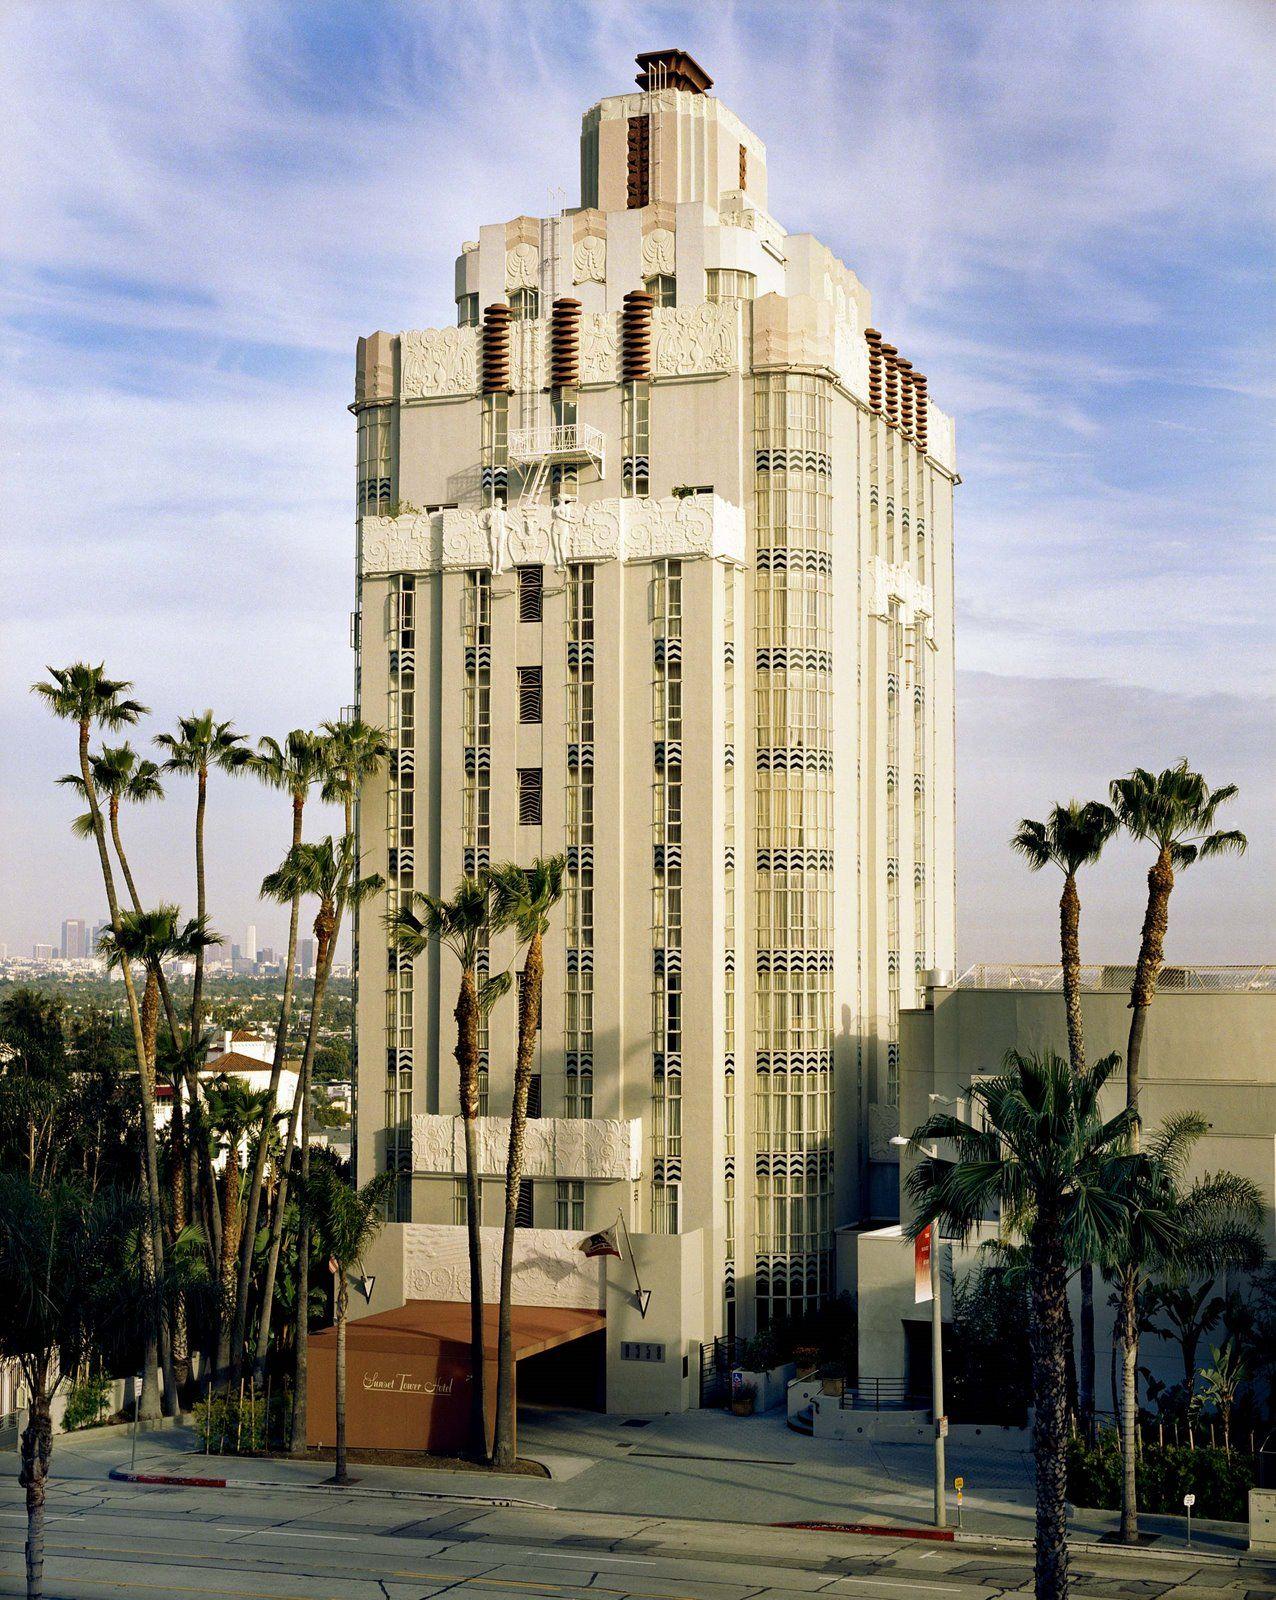 Sunset Tower Hotel Los Angeles California Elizabeth Taylor Frank Sinatra And Howard Hughes Were Am Los Angeles Hotels Hotel Sunset Dog Friendly Vacation